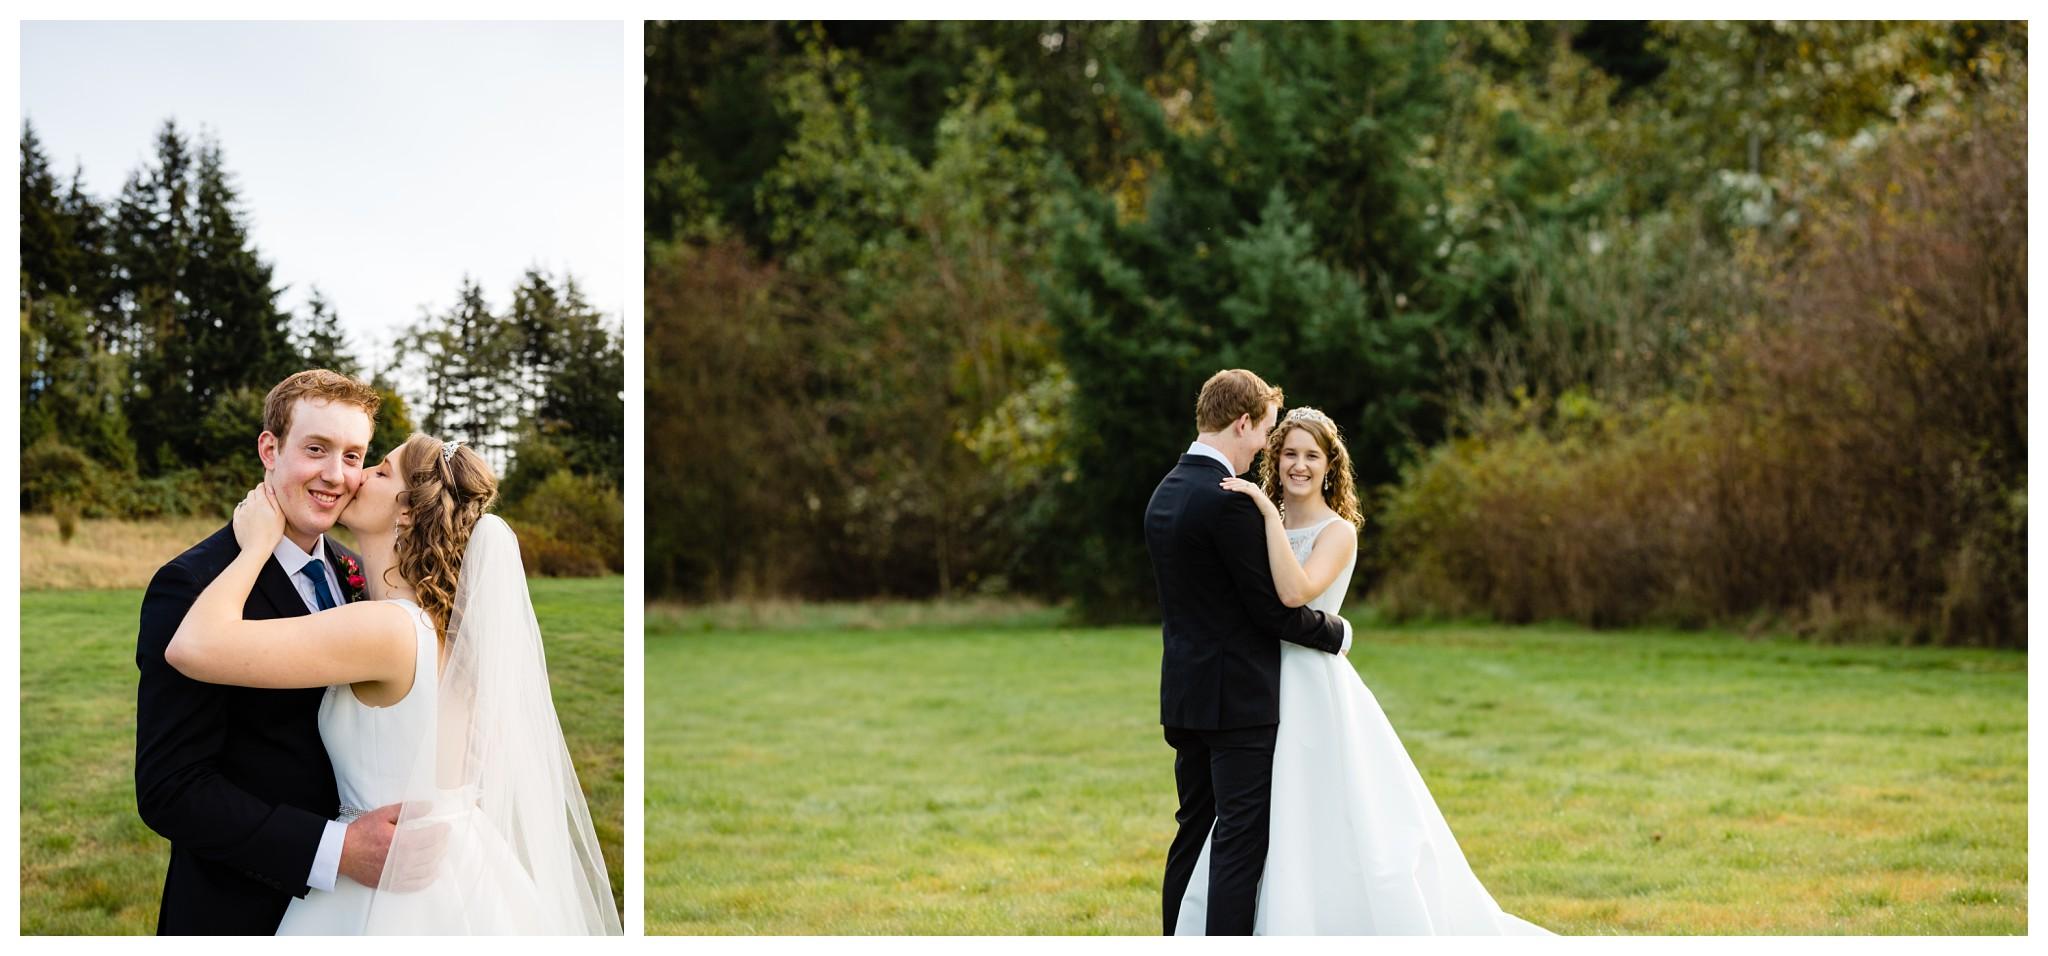 Aldergrove Park Christian Church Wedding Photography Pink Flowers Blue Bridesmaid Dress Fall_0112.jpg